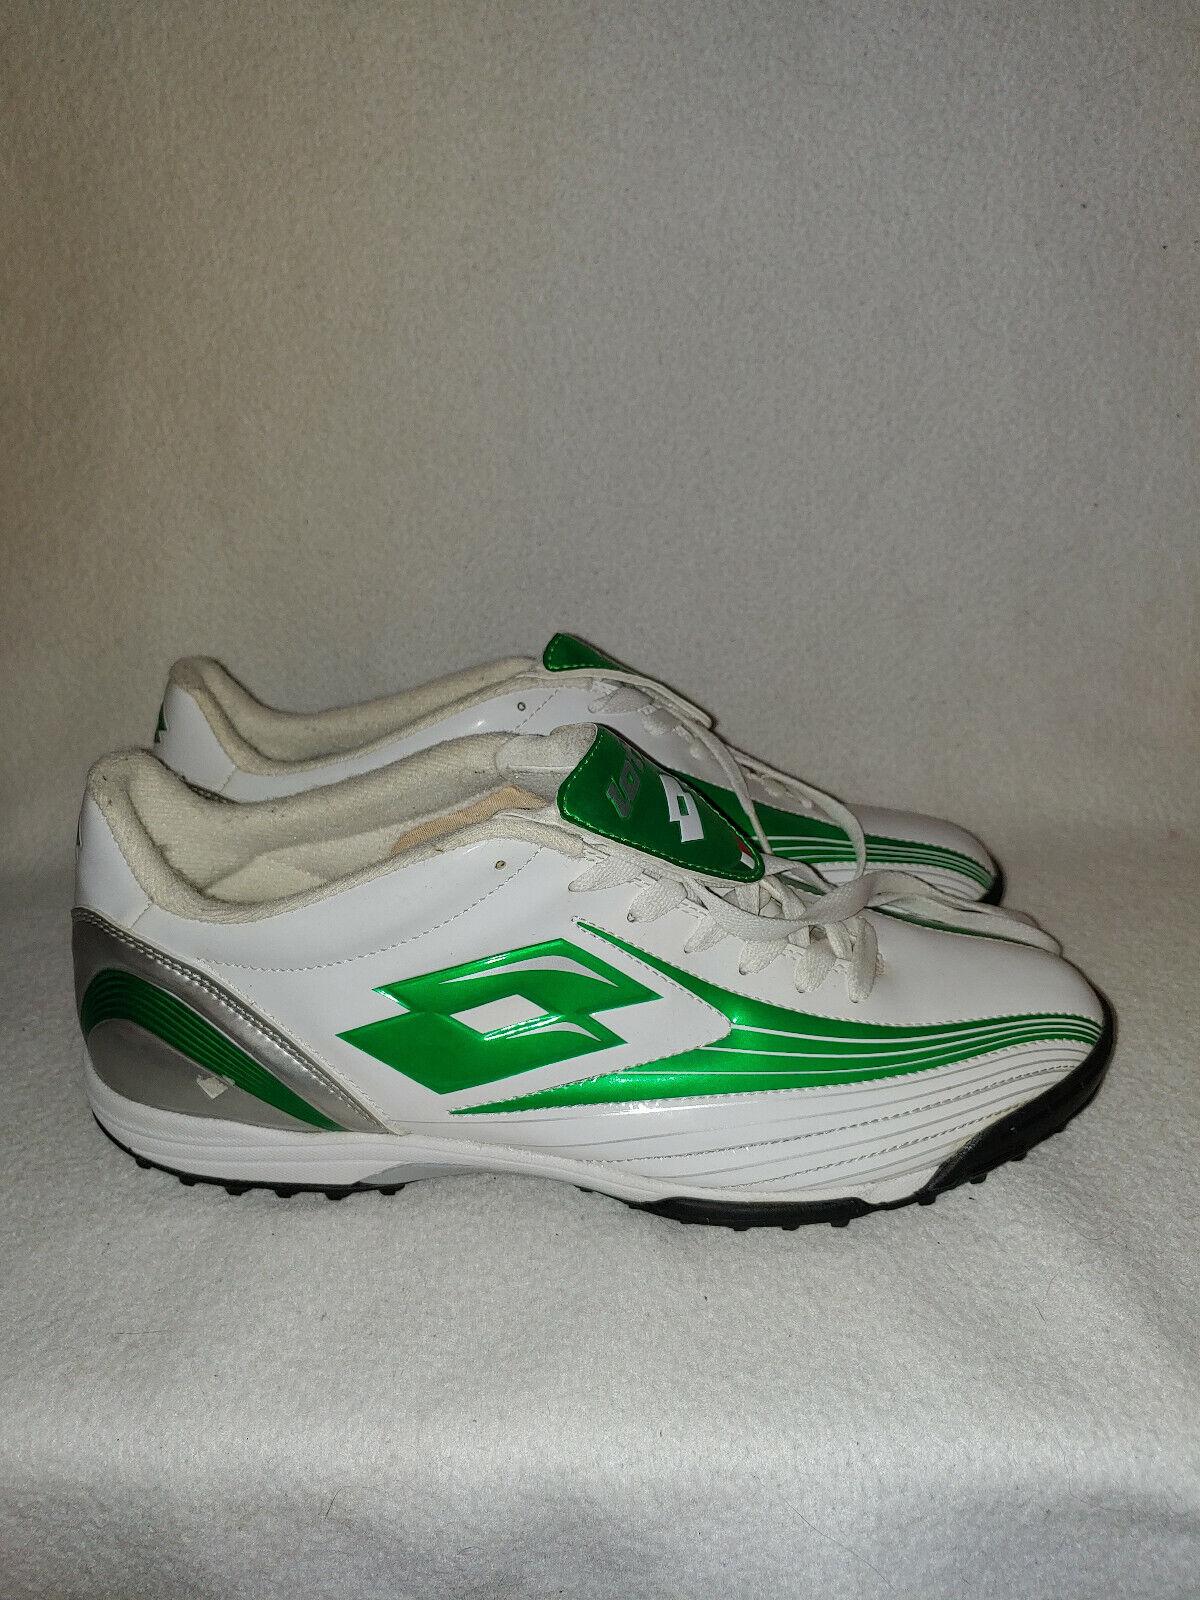 Men Lotto White Green Soccer Lacrosse Cleats Athletic Shoe Size 11 44